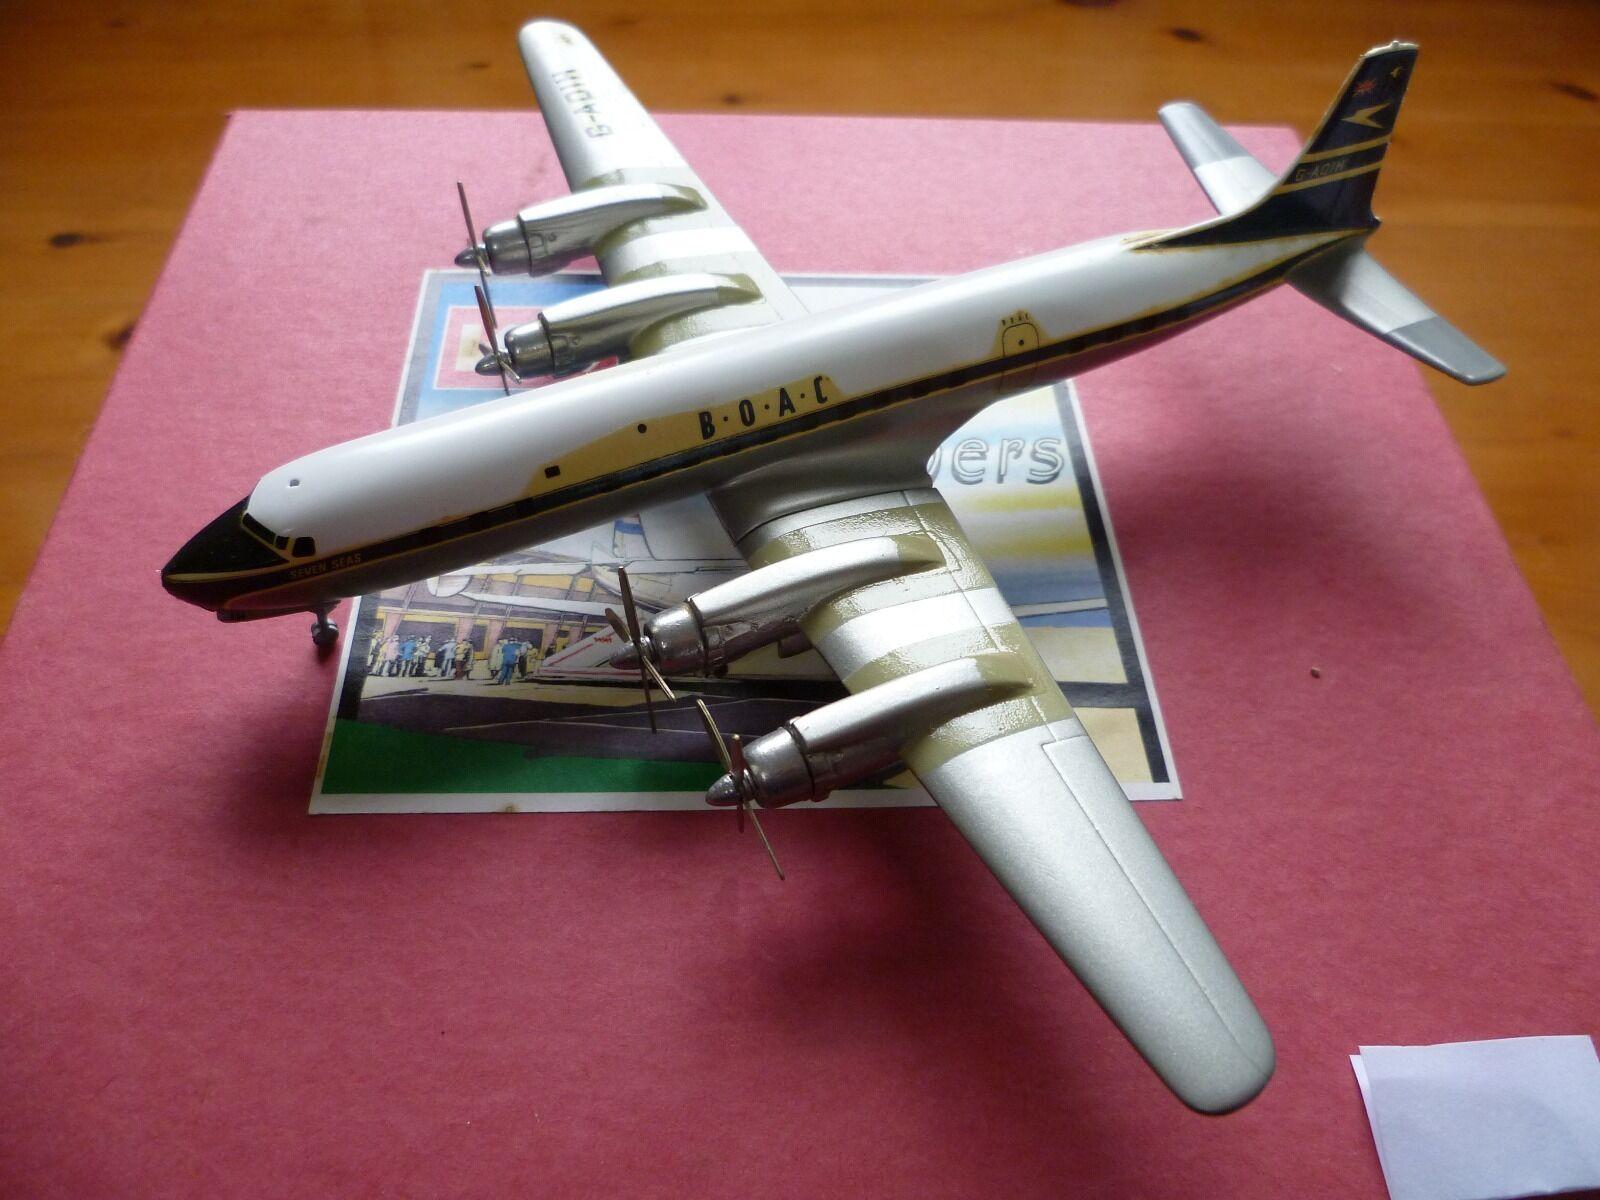 Molto RARO WESTERN MODELS CA2F DOUGLAS DC-7C B.O.A.C.  blu scuro Pinna Caudale